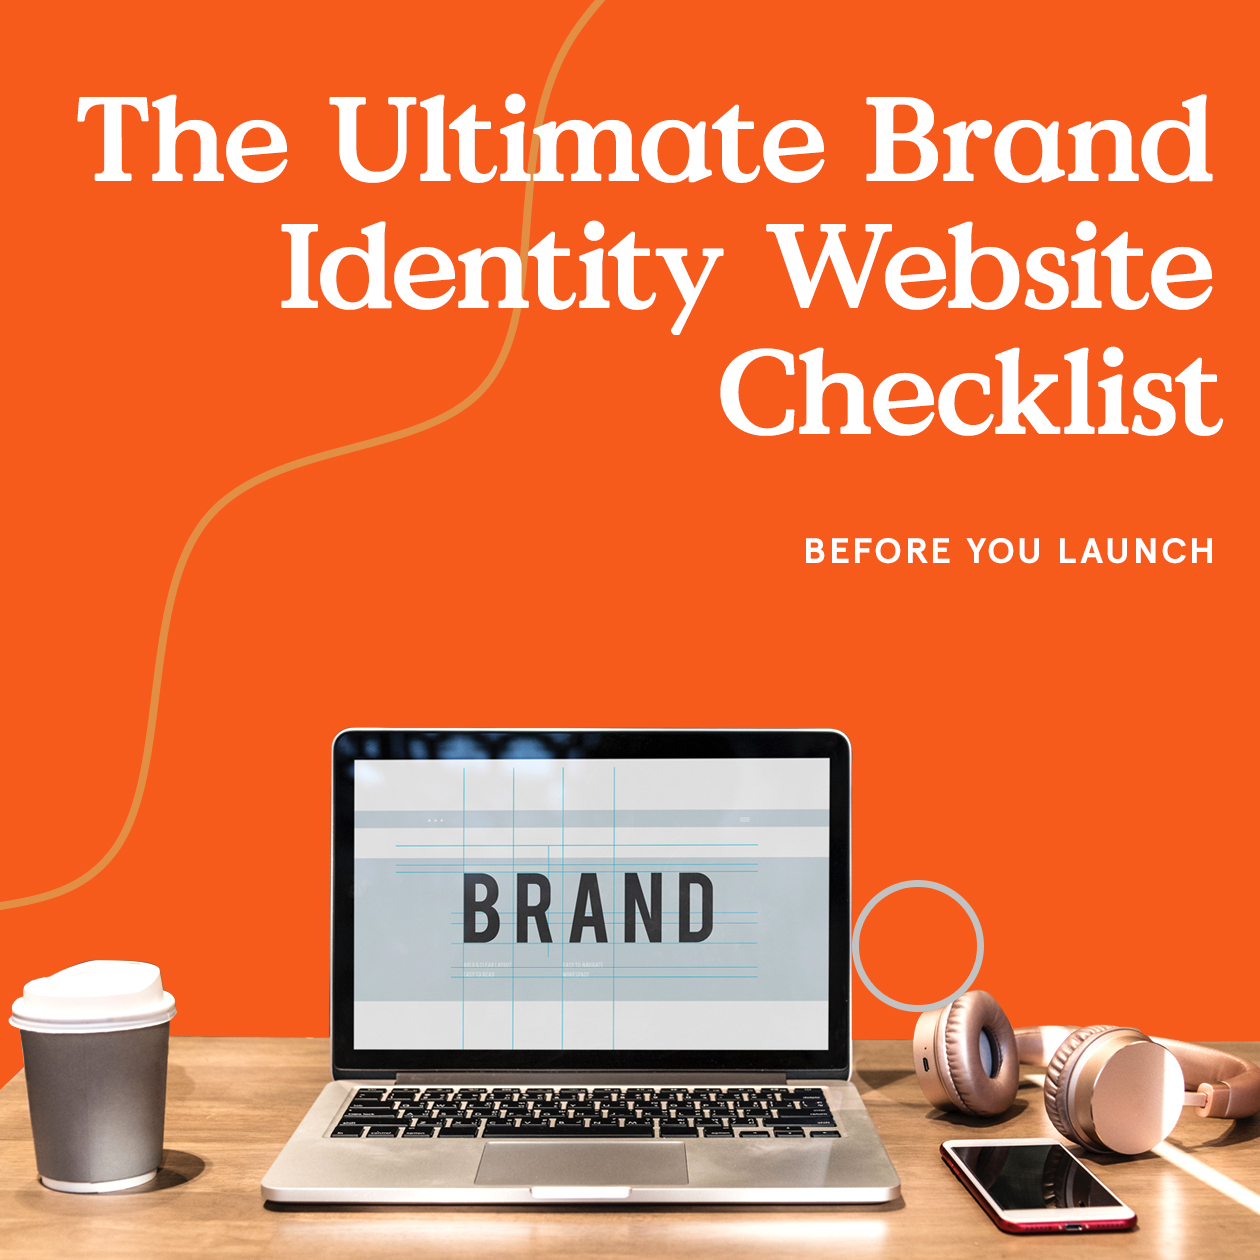 The Ultimate Brand Identity Website Checklist